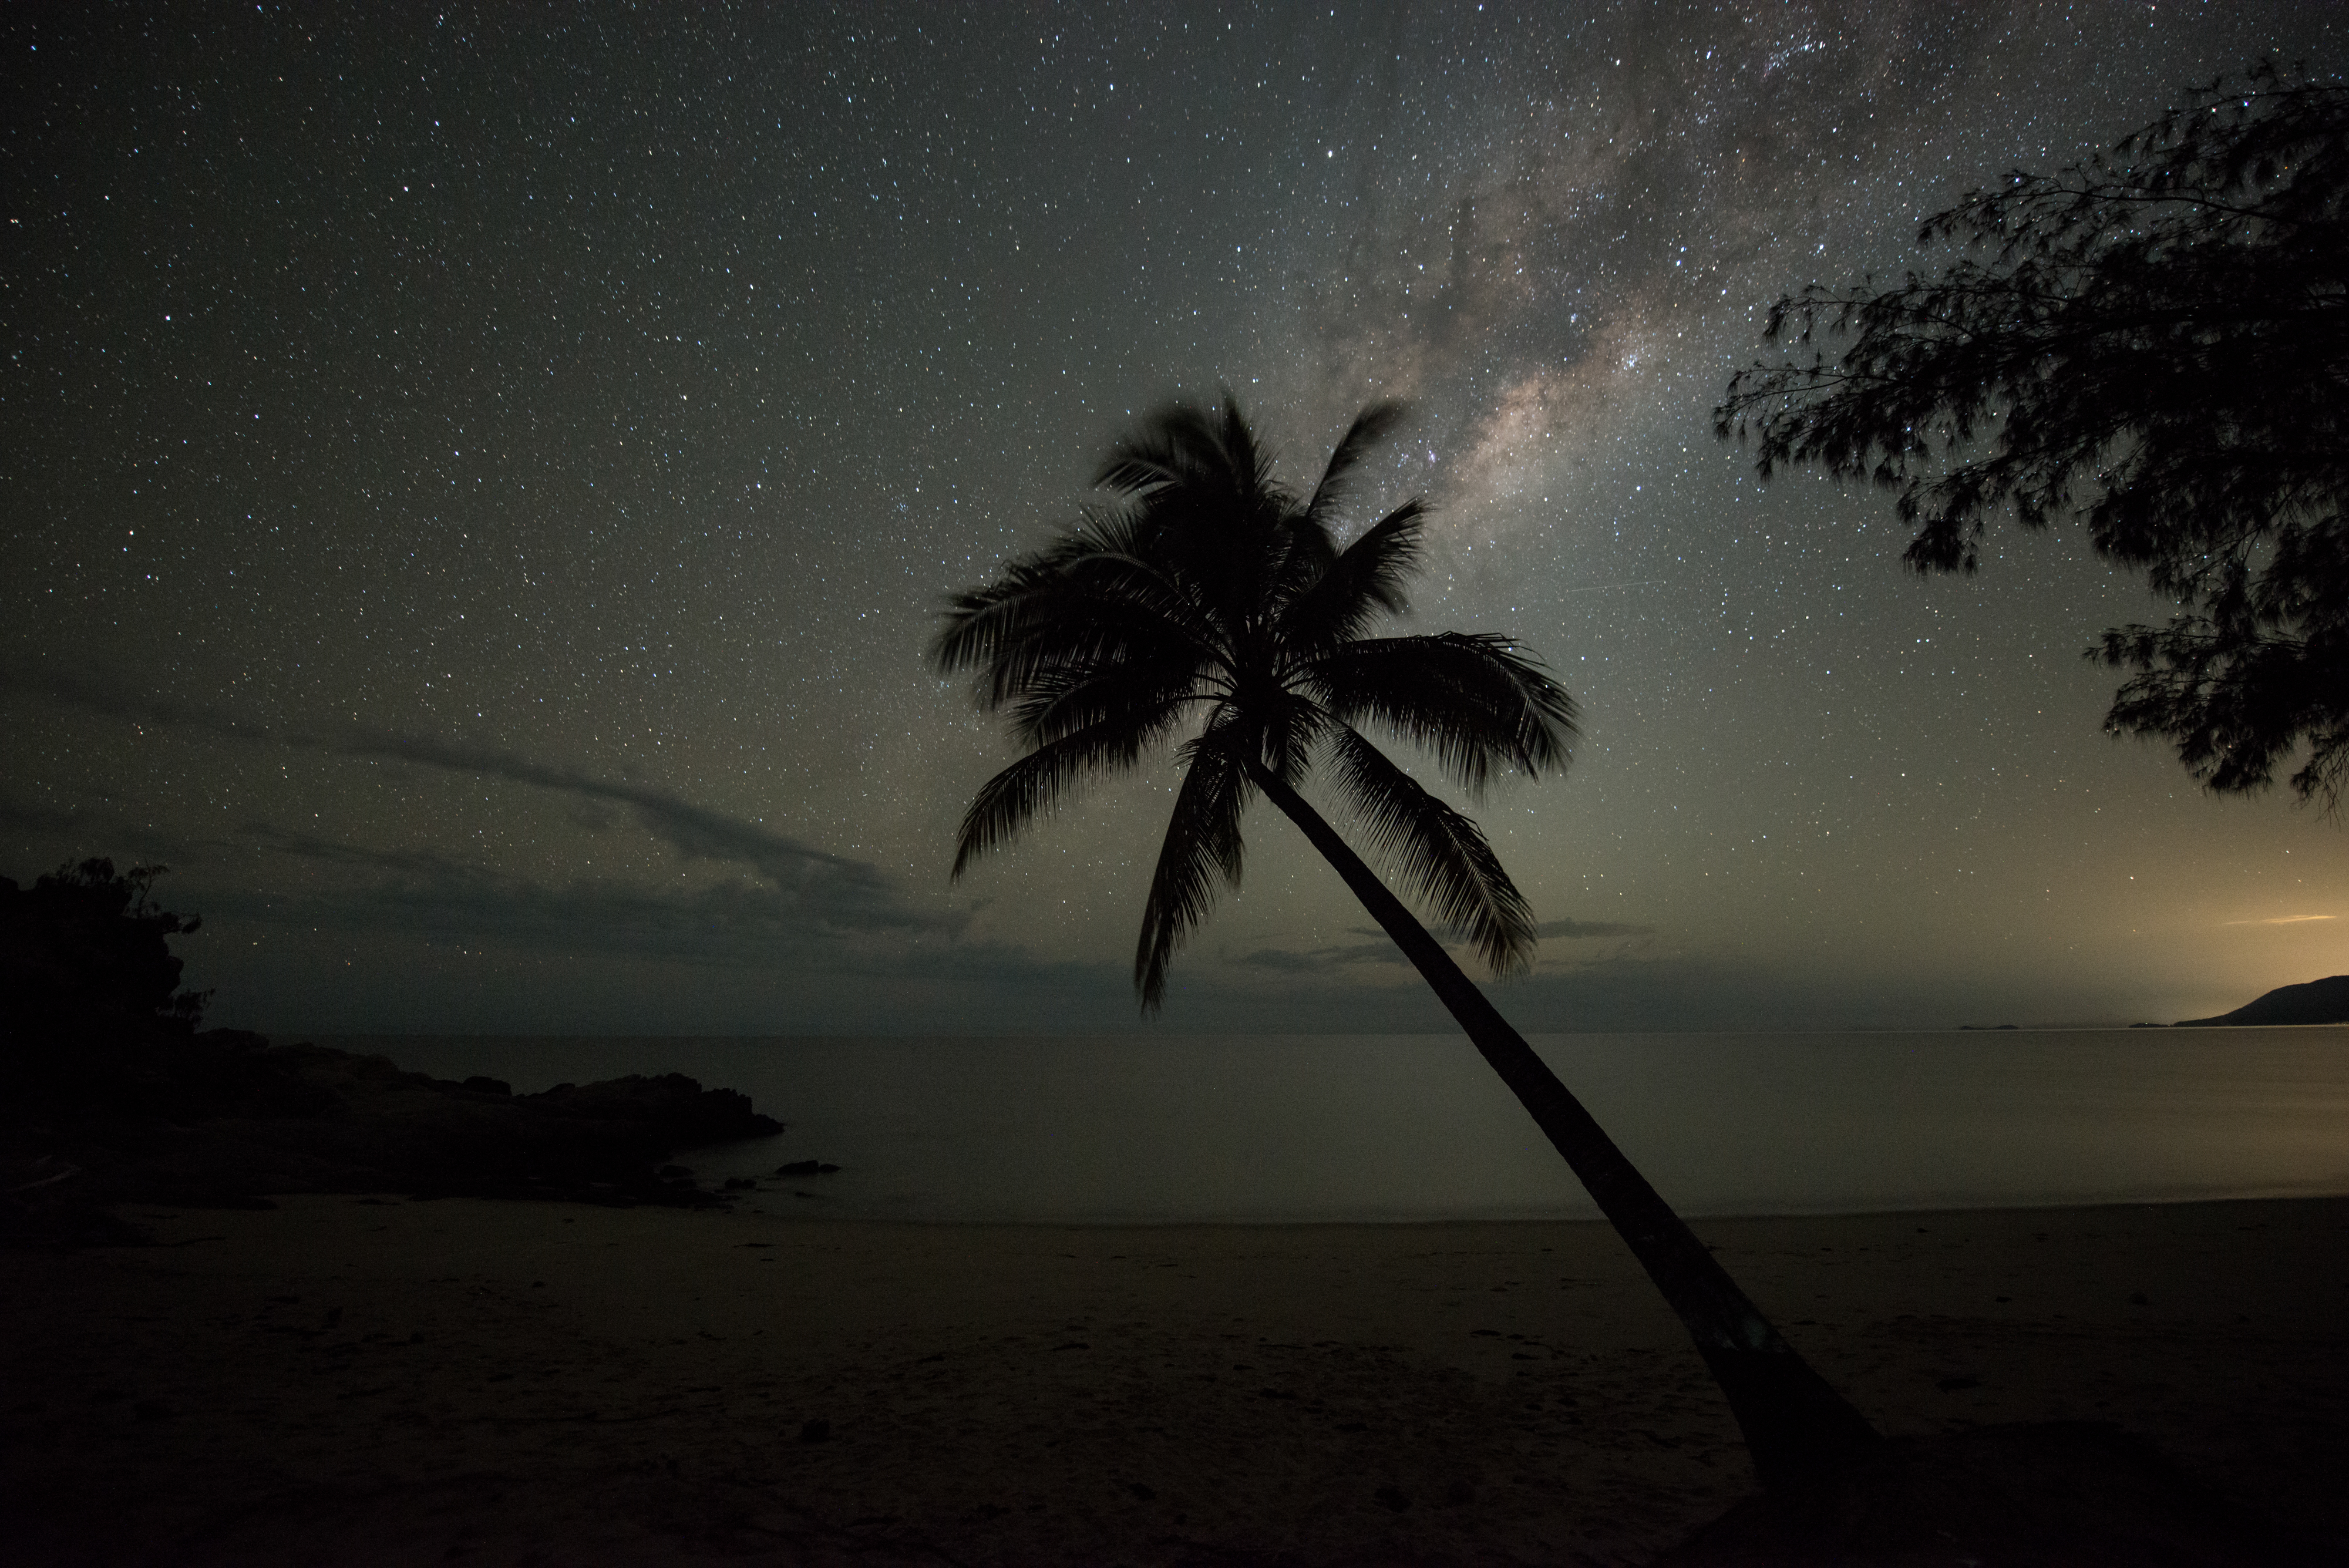 http://www.thalabeach.com.au/wp-content/uploads/2010/07/Thala_Beach_Nature_Reserve_2016__48.jpg